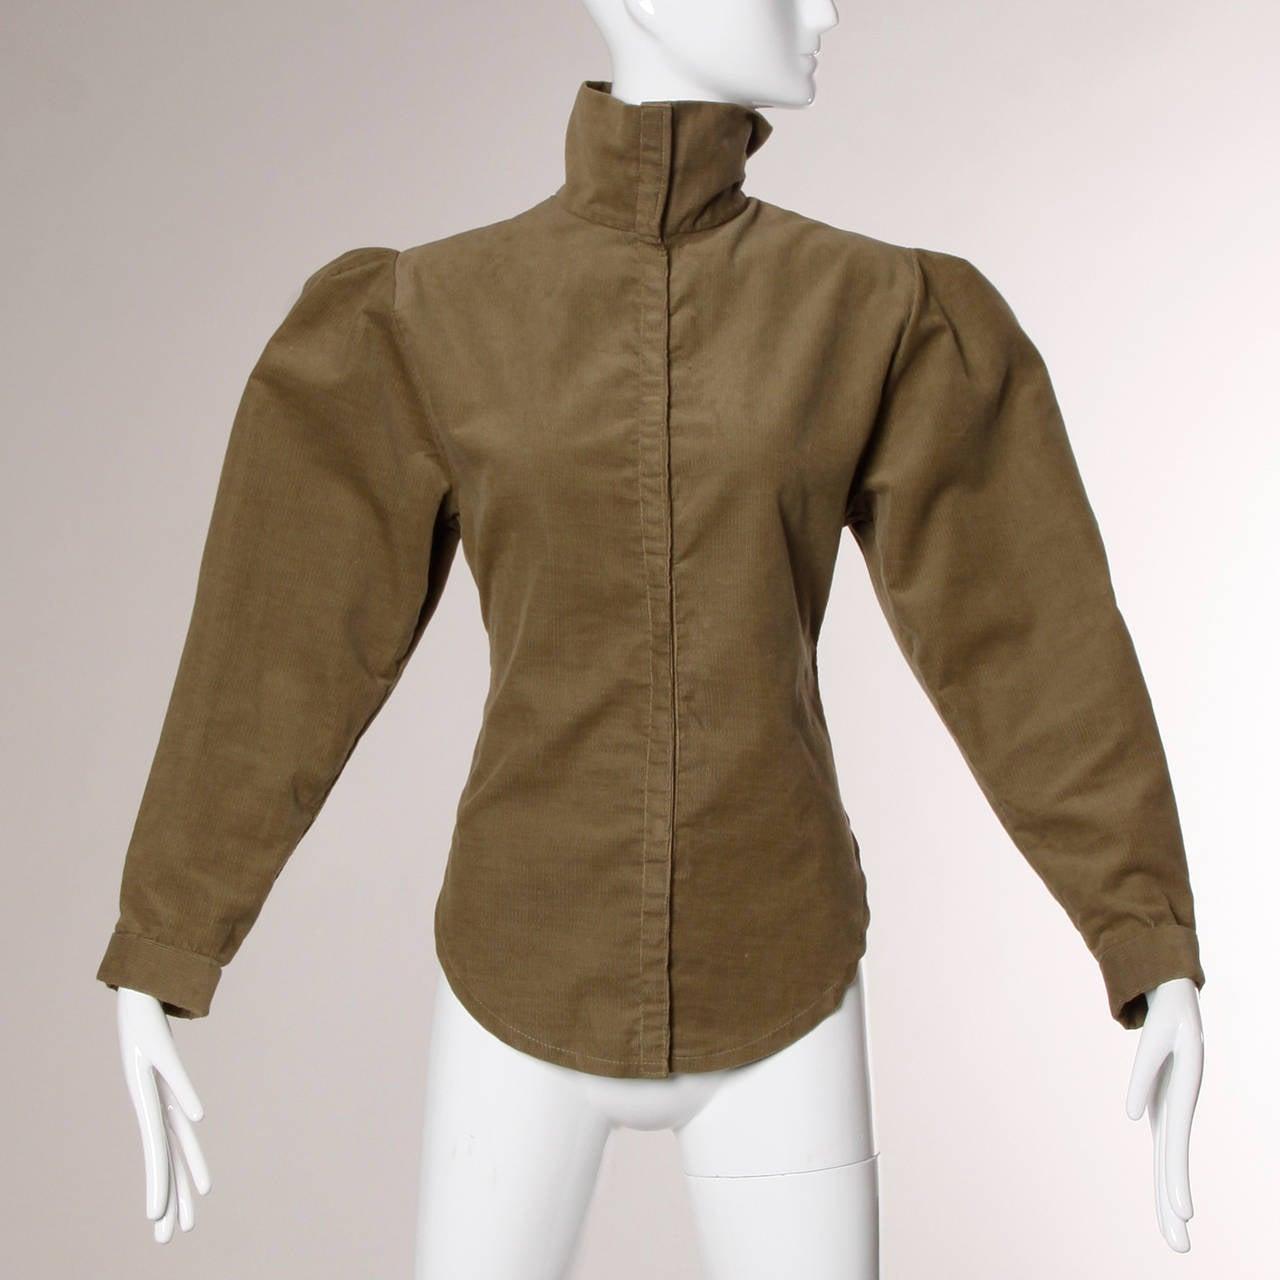 Norma Kamali Vintage Avant Garde Top or Jacket In Excellent Condition For Sale In Sparks, NV